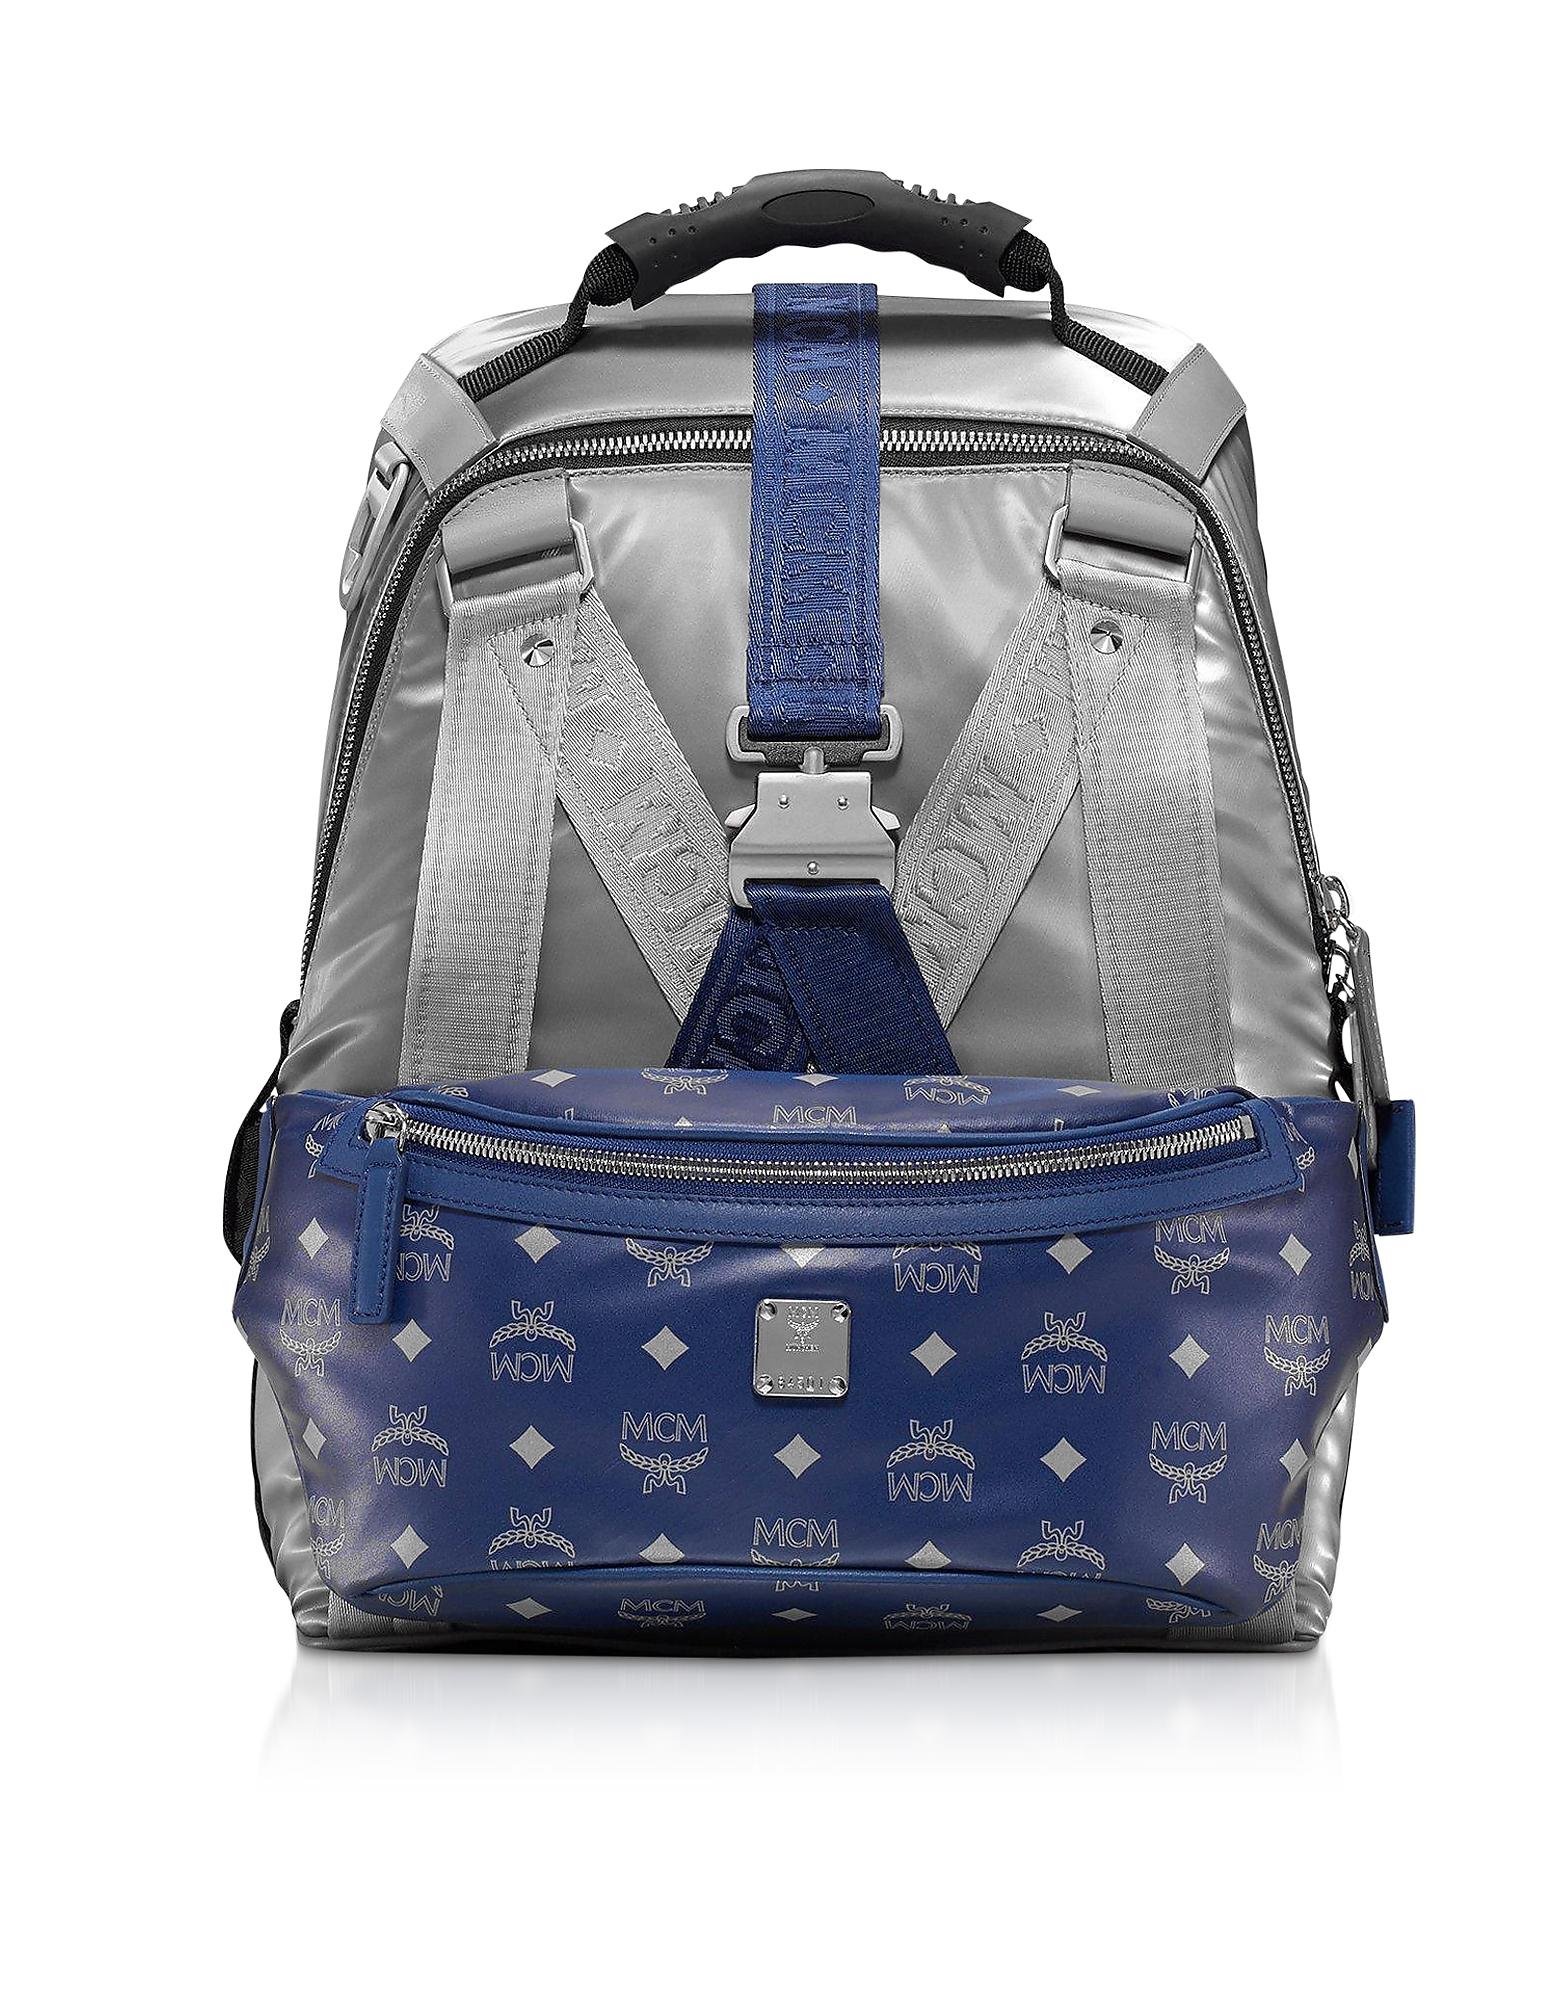 Metallic Silver Jemison Nylon Medium Backpack